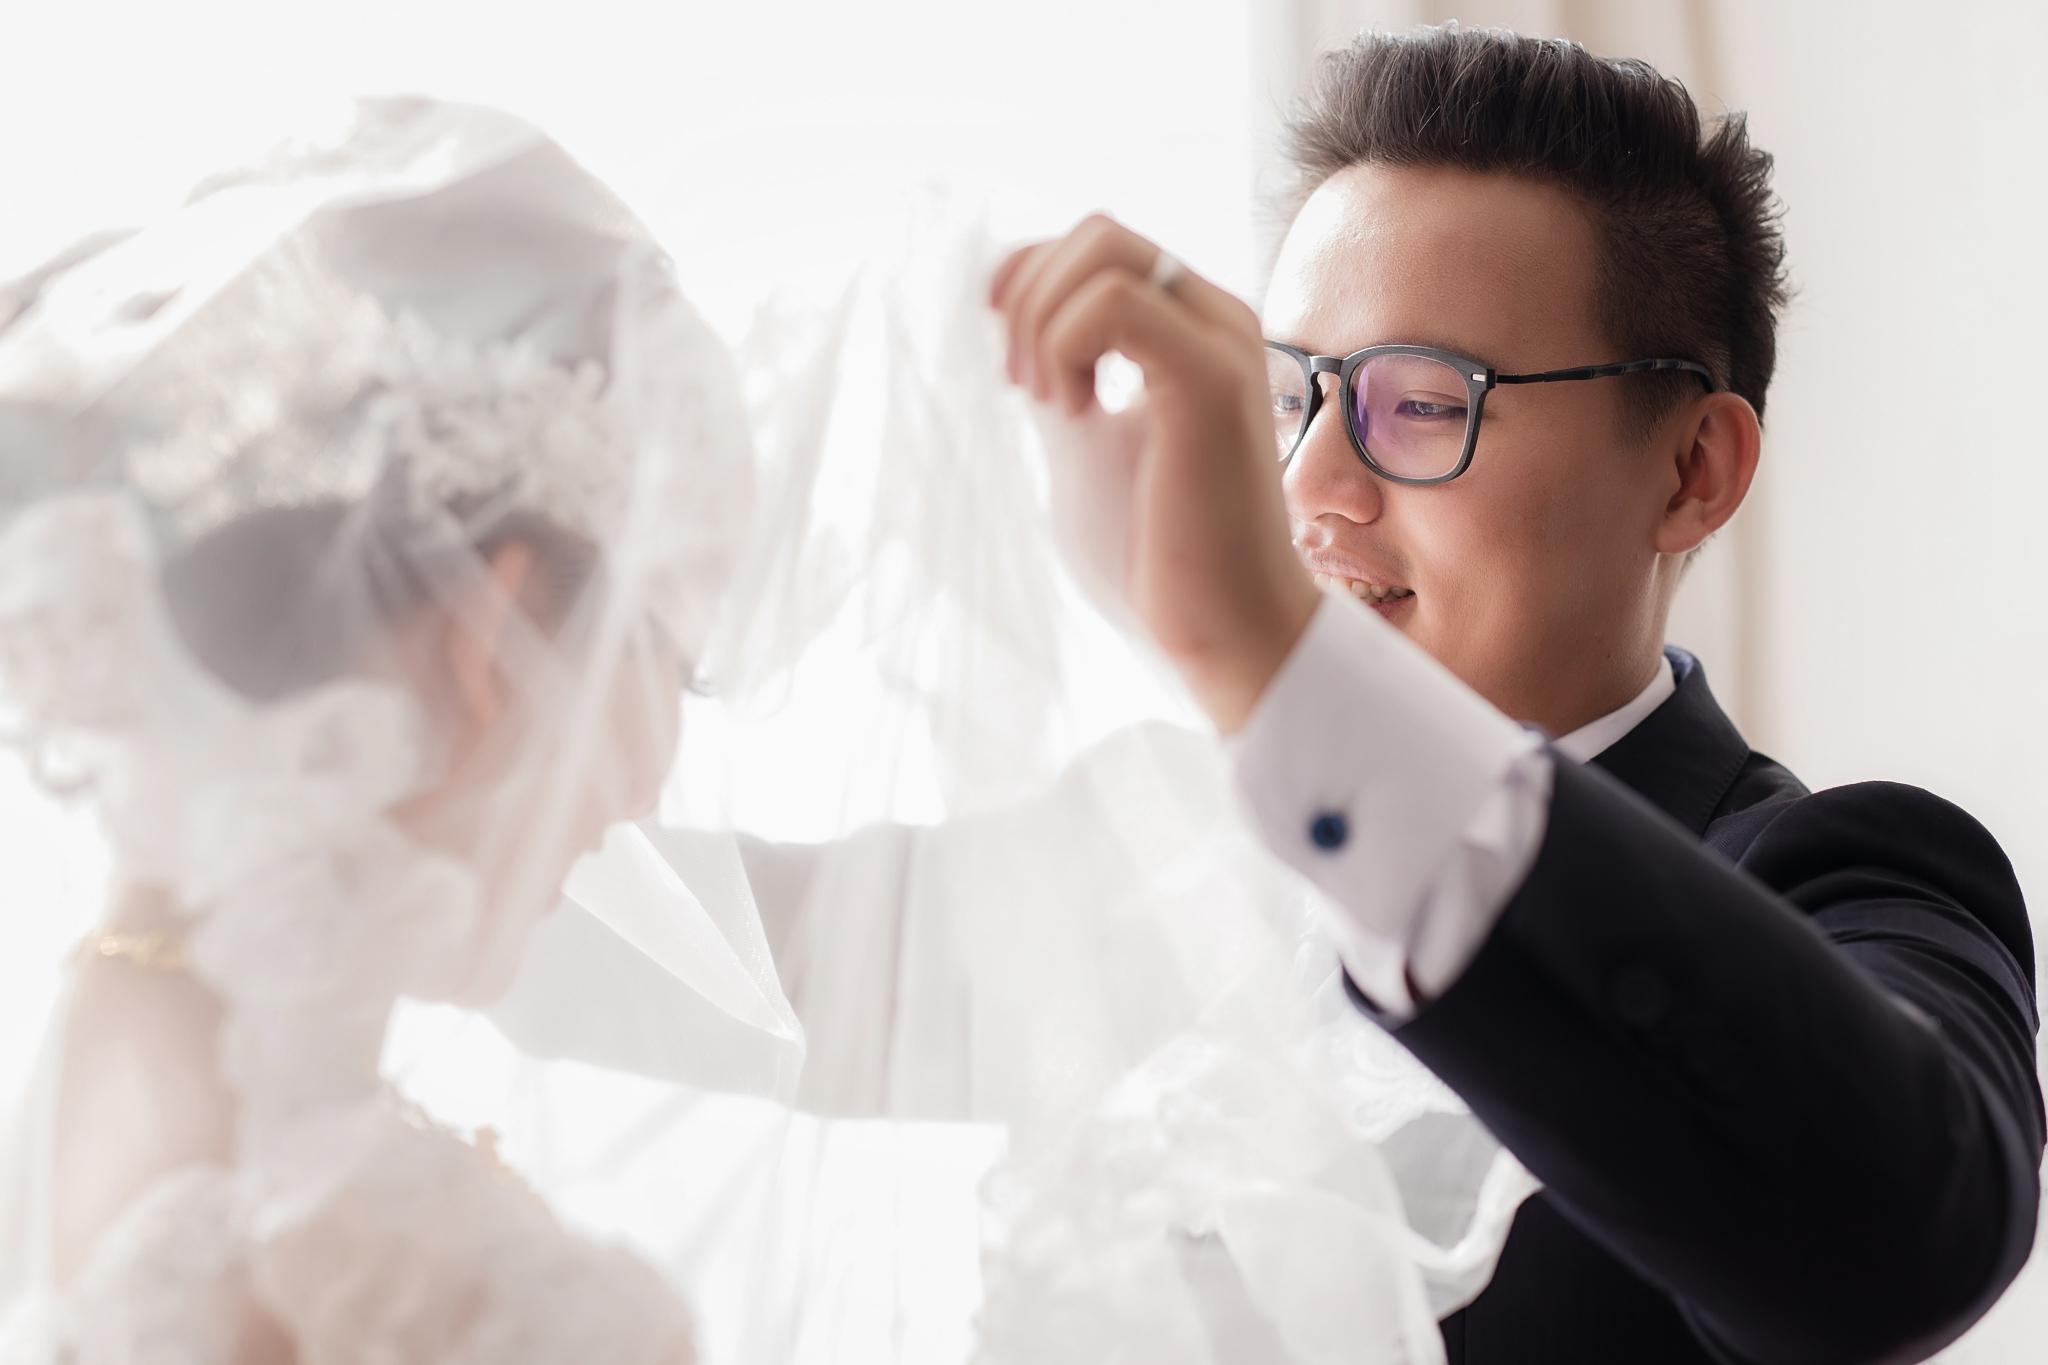 078-wedding